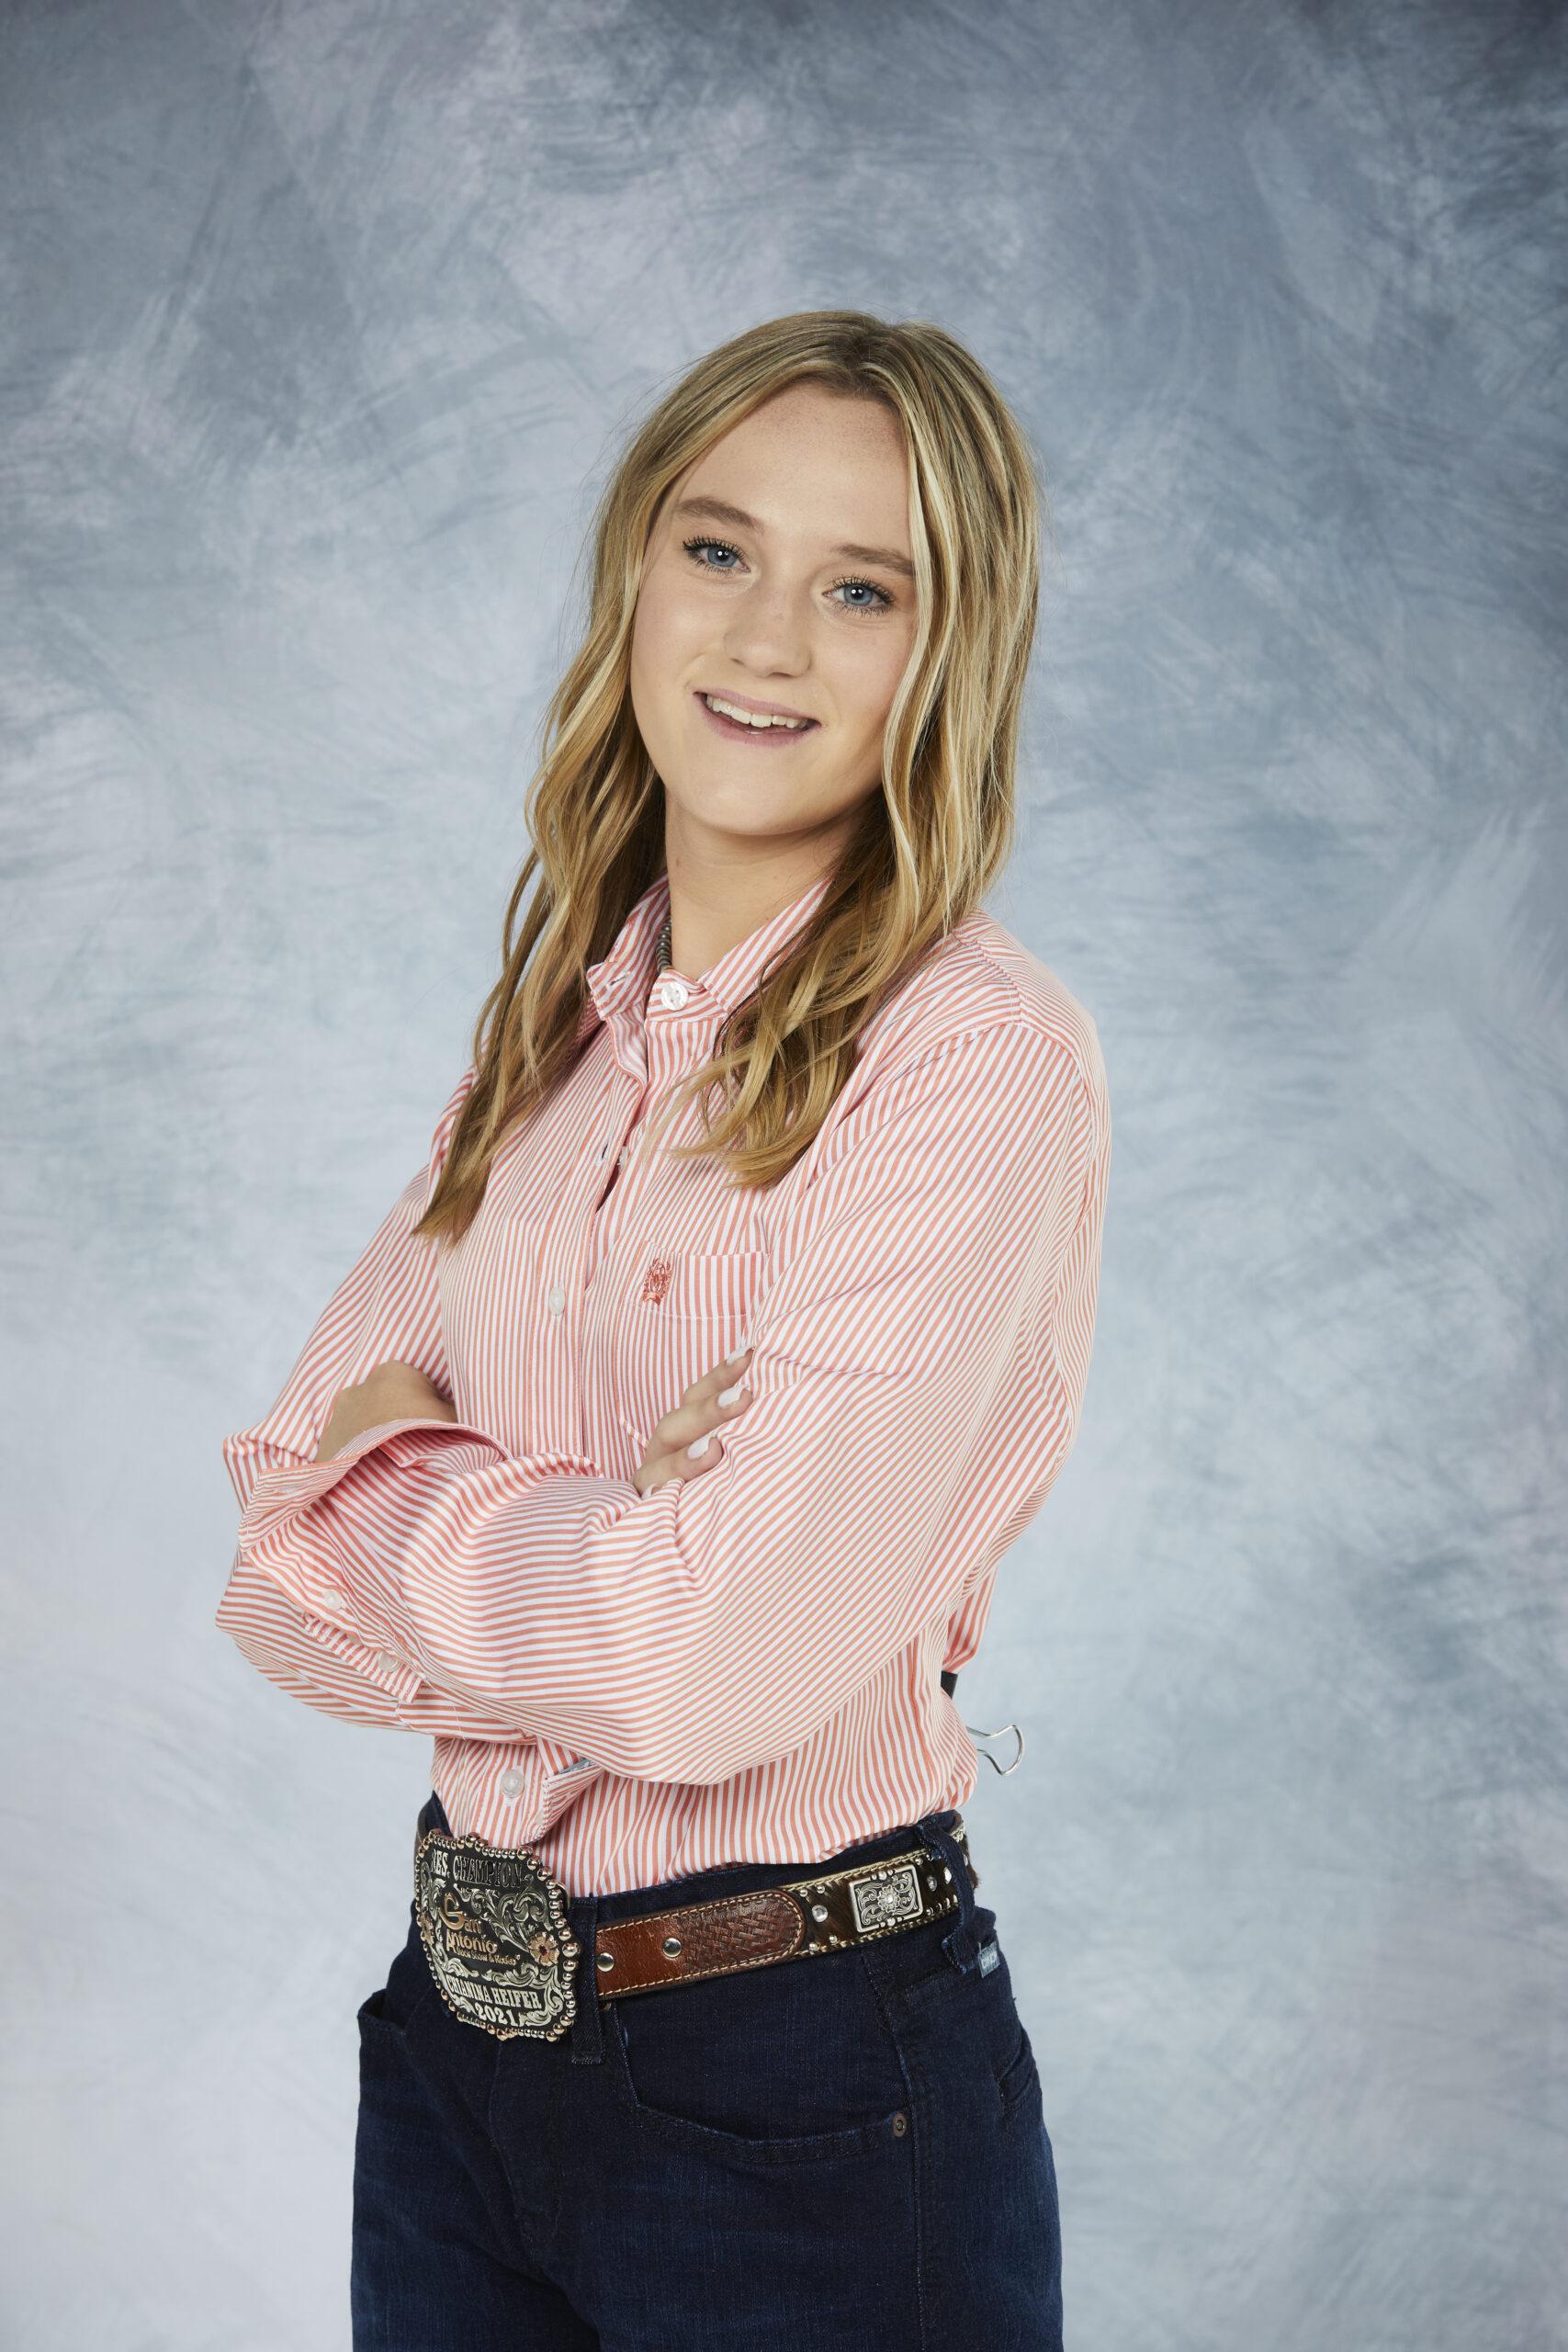 Cora Hardy